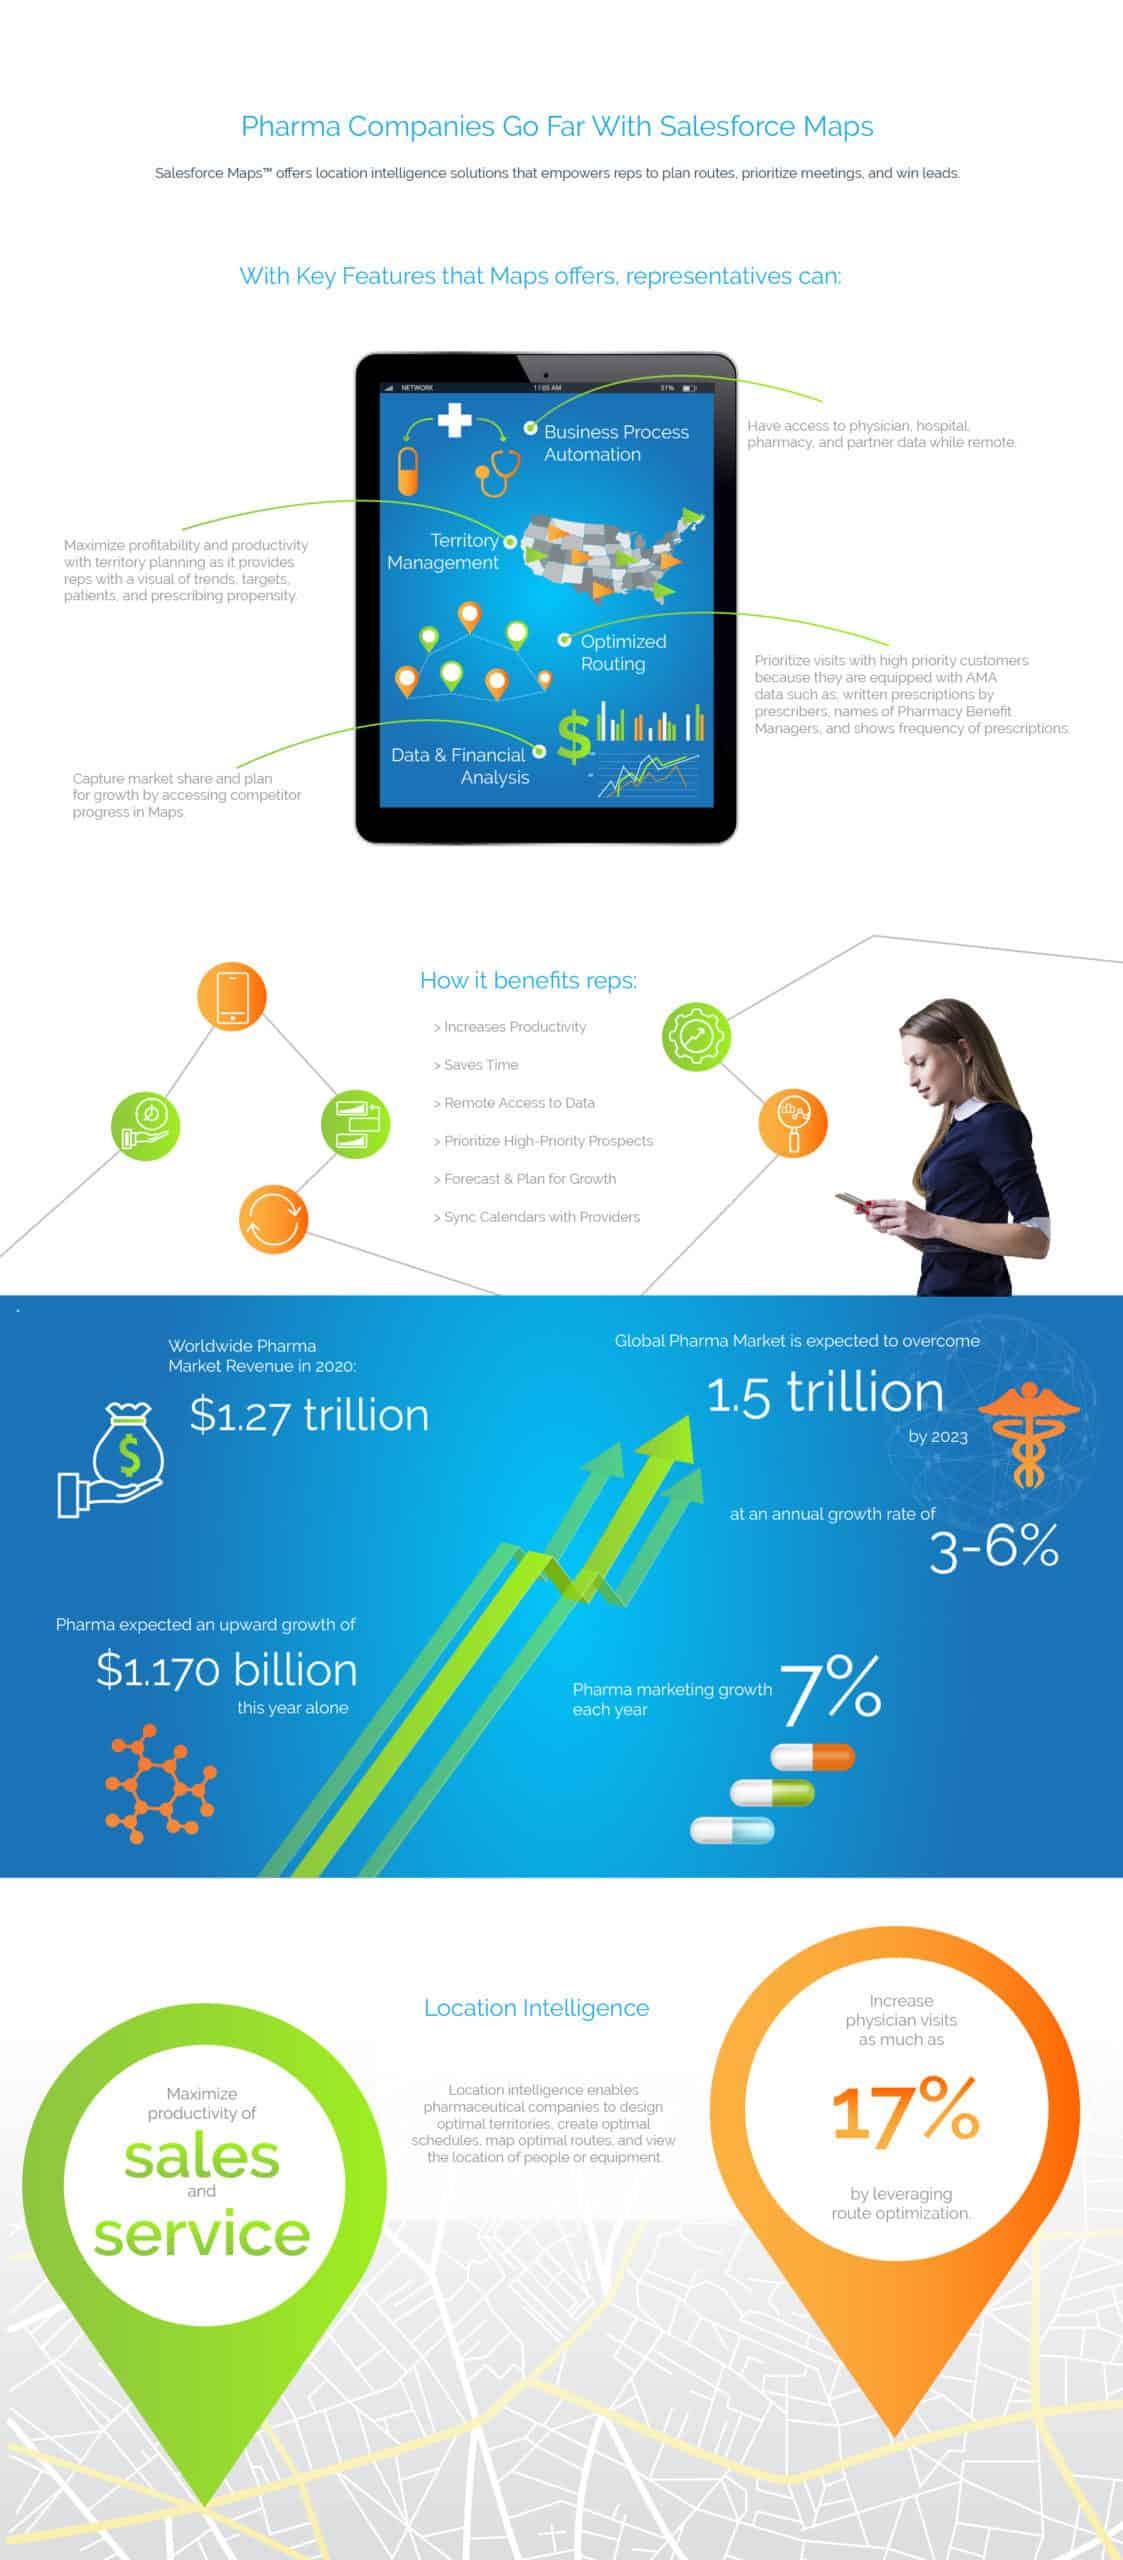 Pharma Companies Go Far with Salesforce Maps